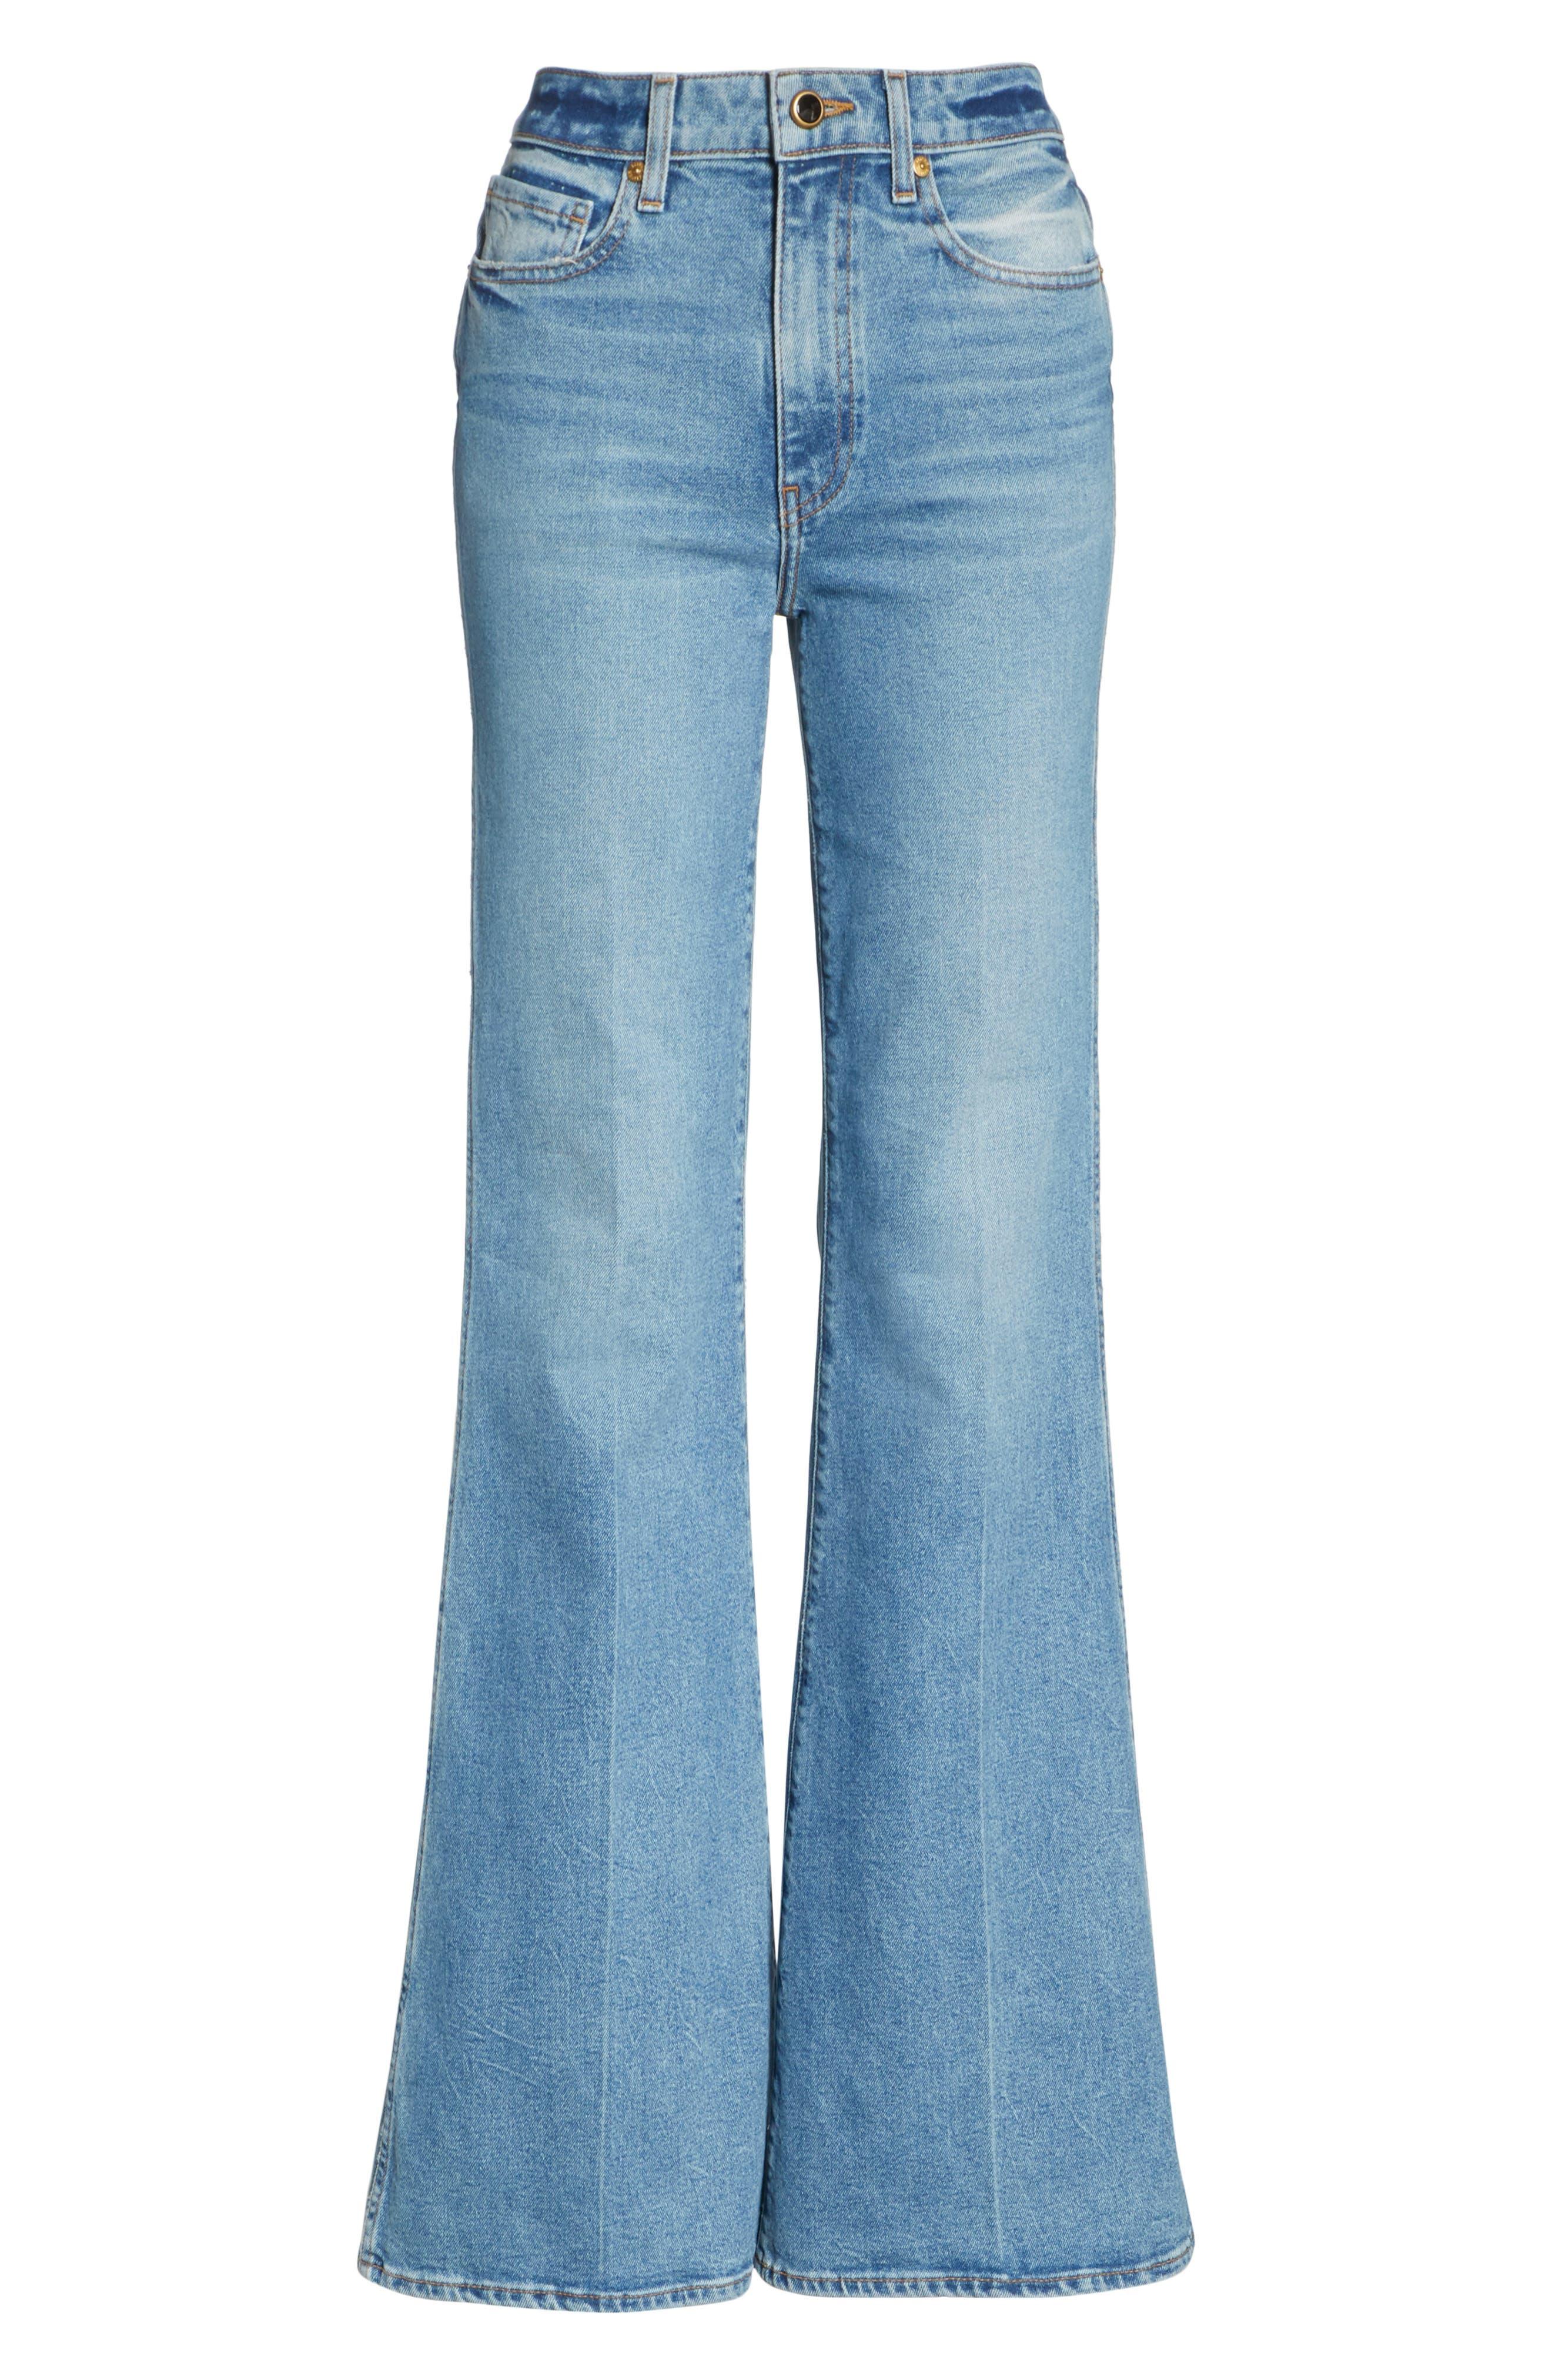 Reece Flare Jeans,                             Alternate thumbnail 6, color,                             401